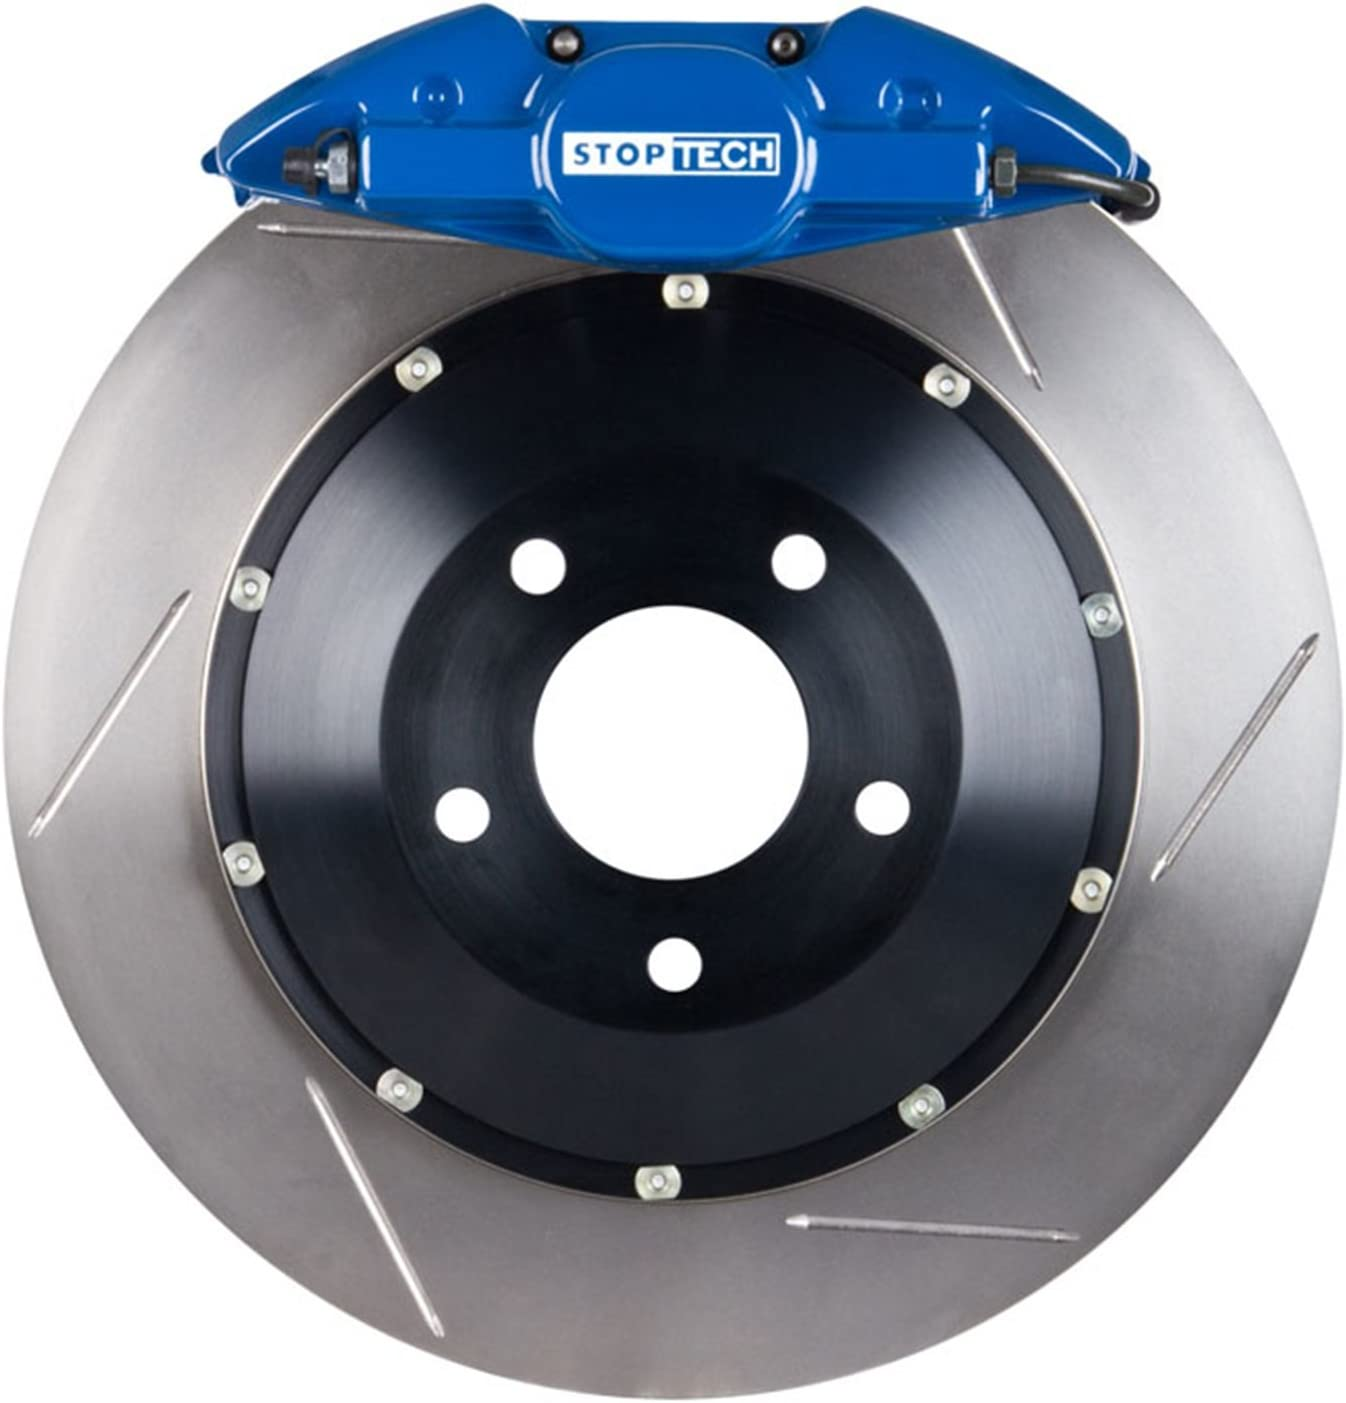 StopTech Max 53% OFF 83.135.002G.21 Big Brake Rotor Kit depot Rear P 1 Piece 2